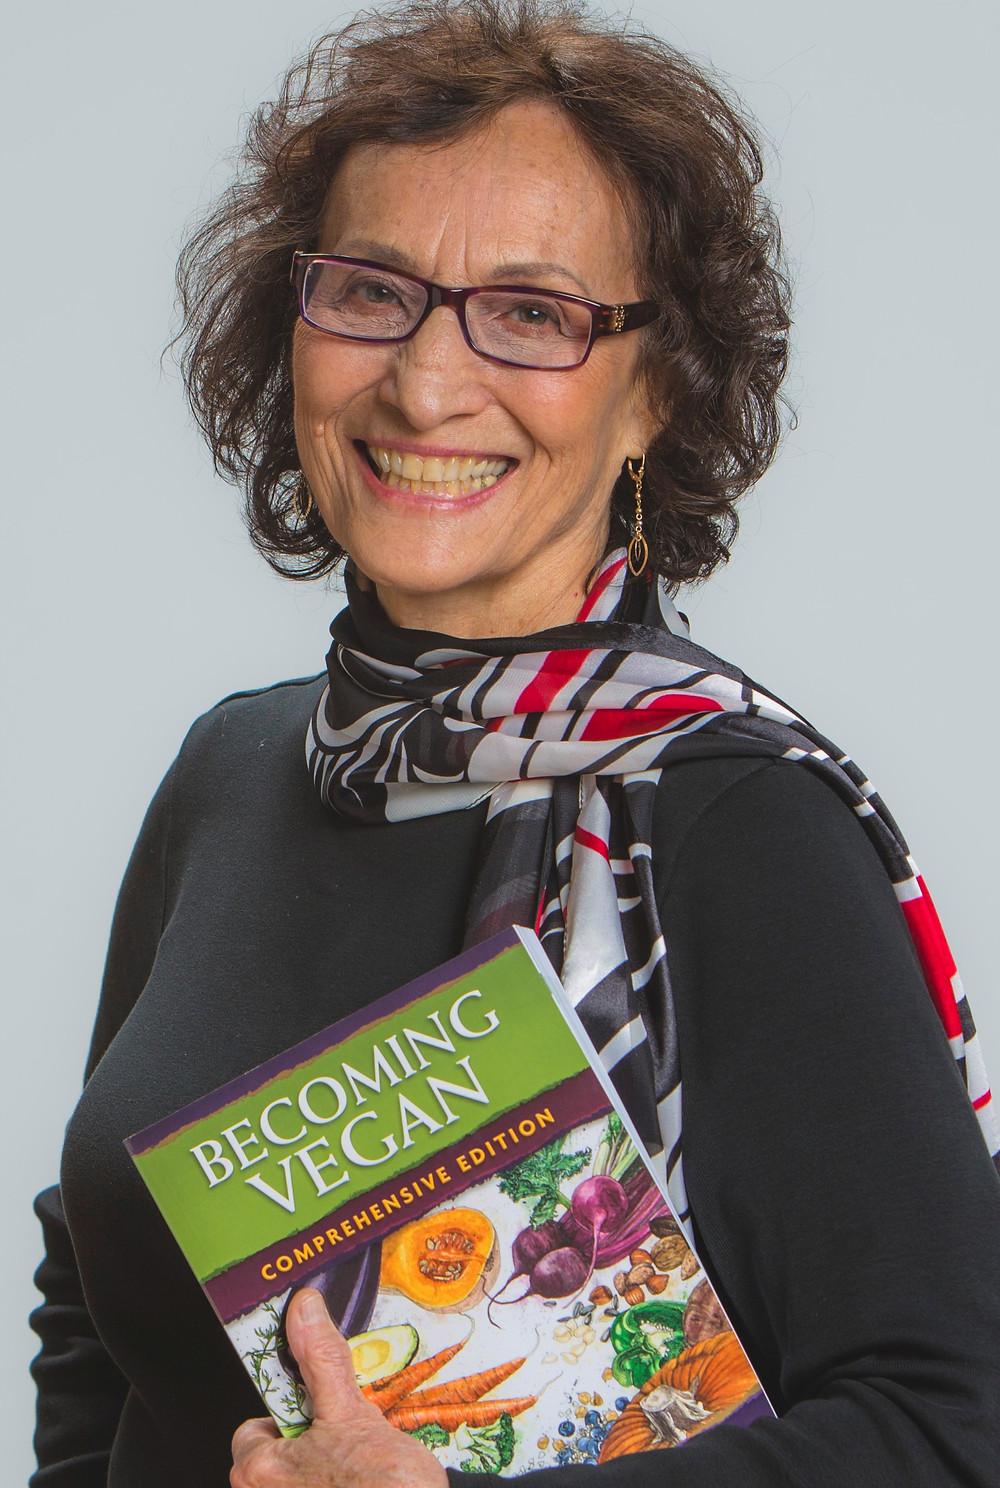 Dietician Vesanto Melina